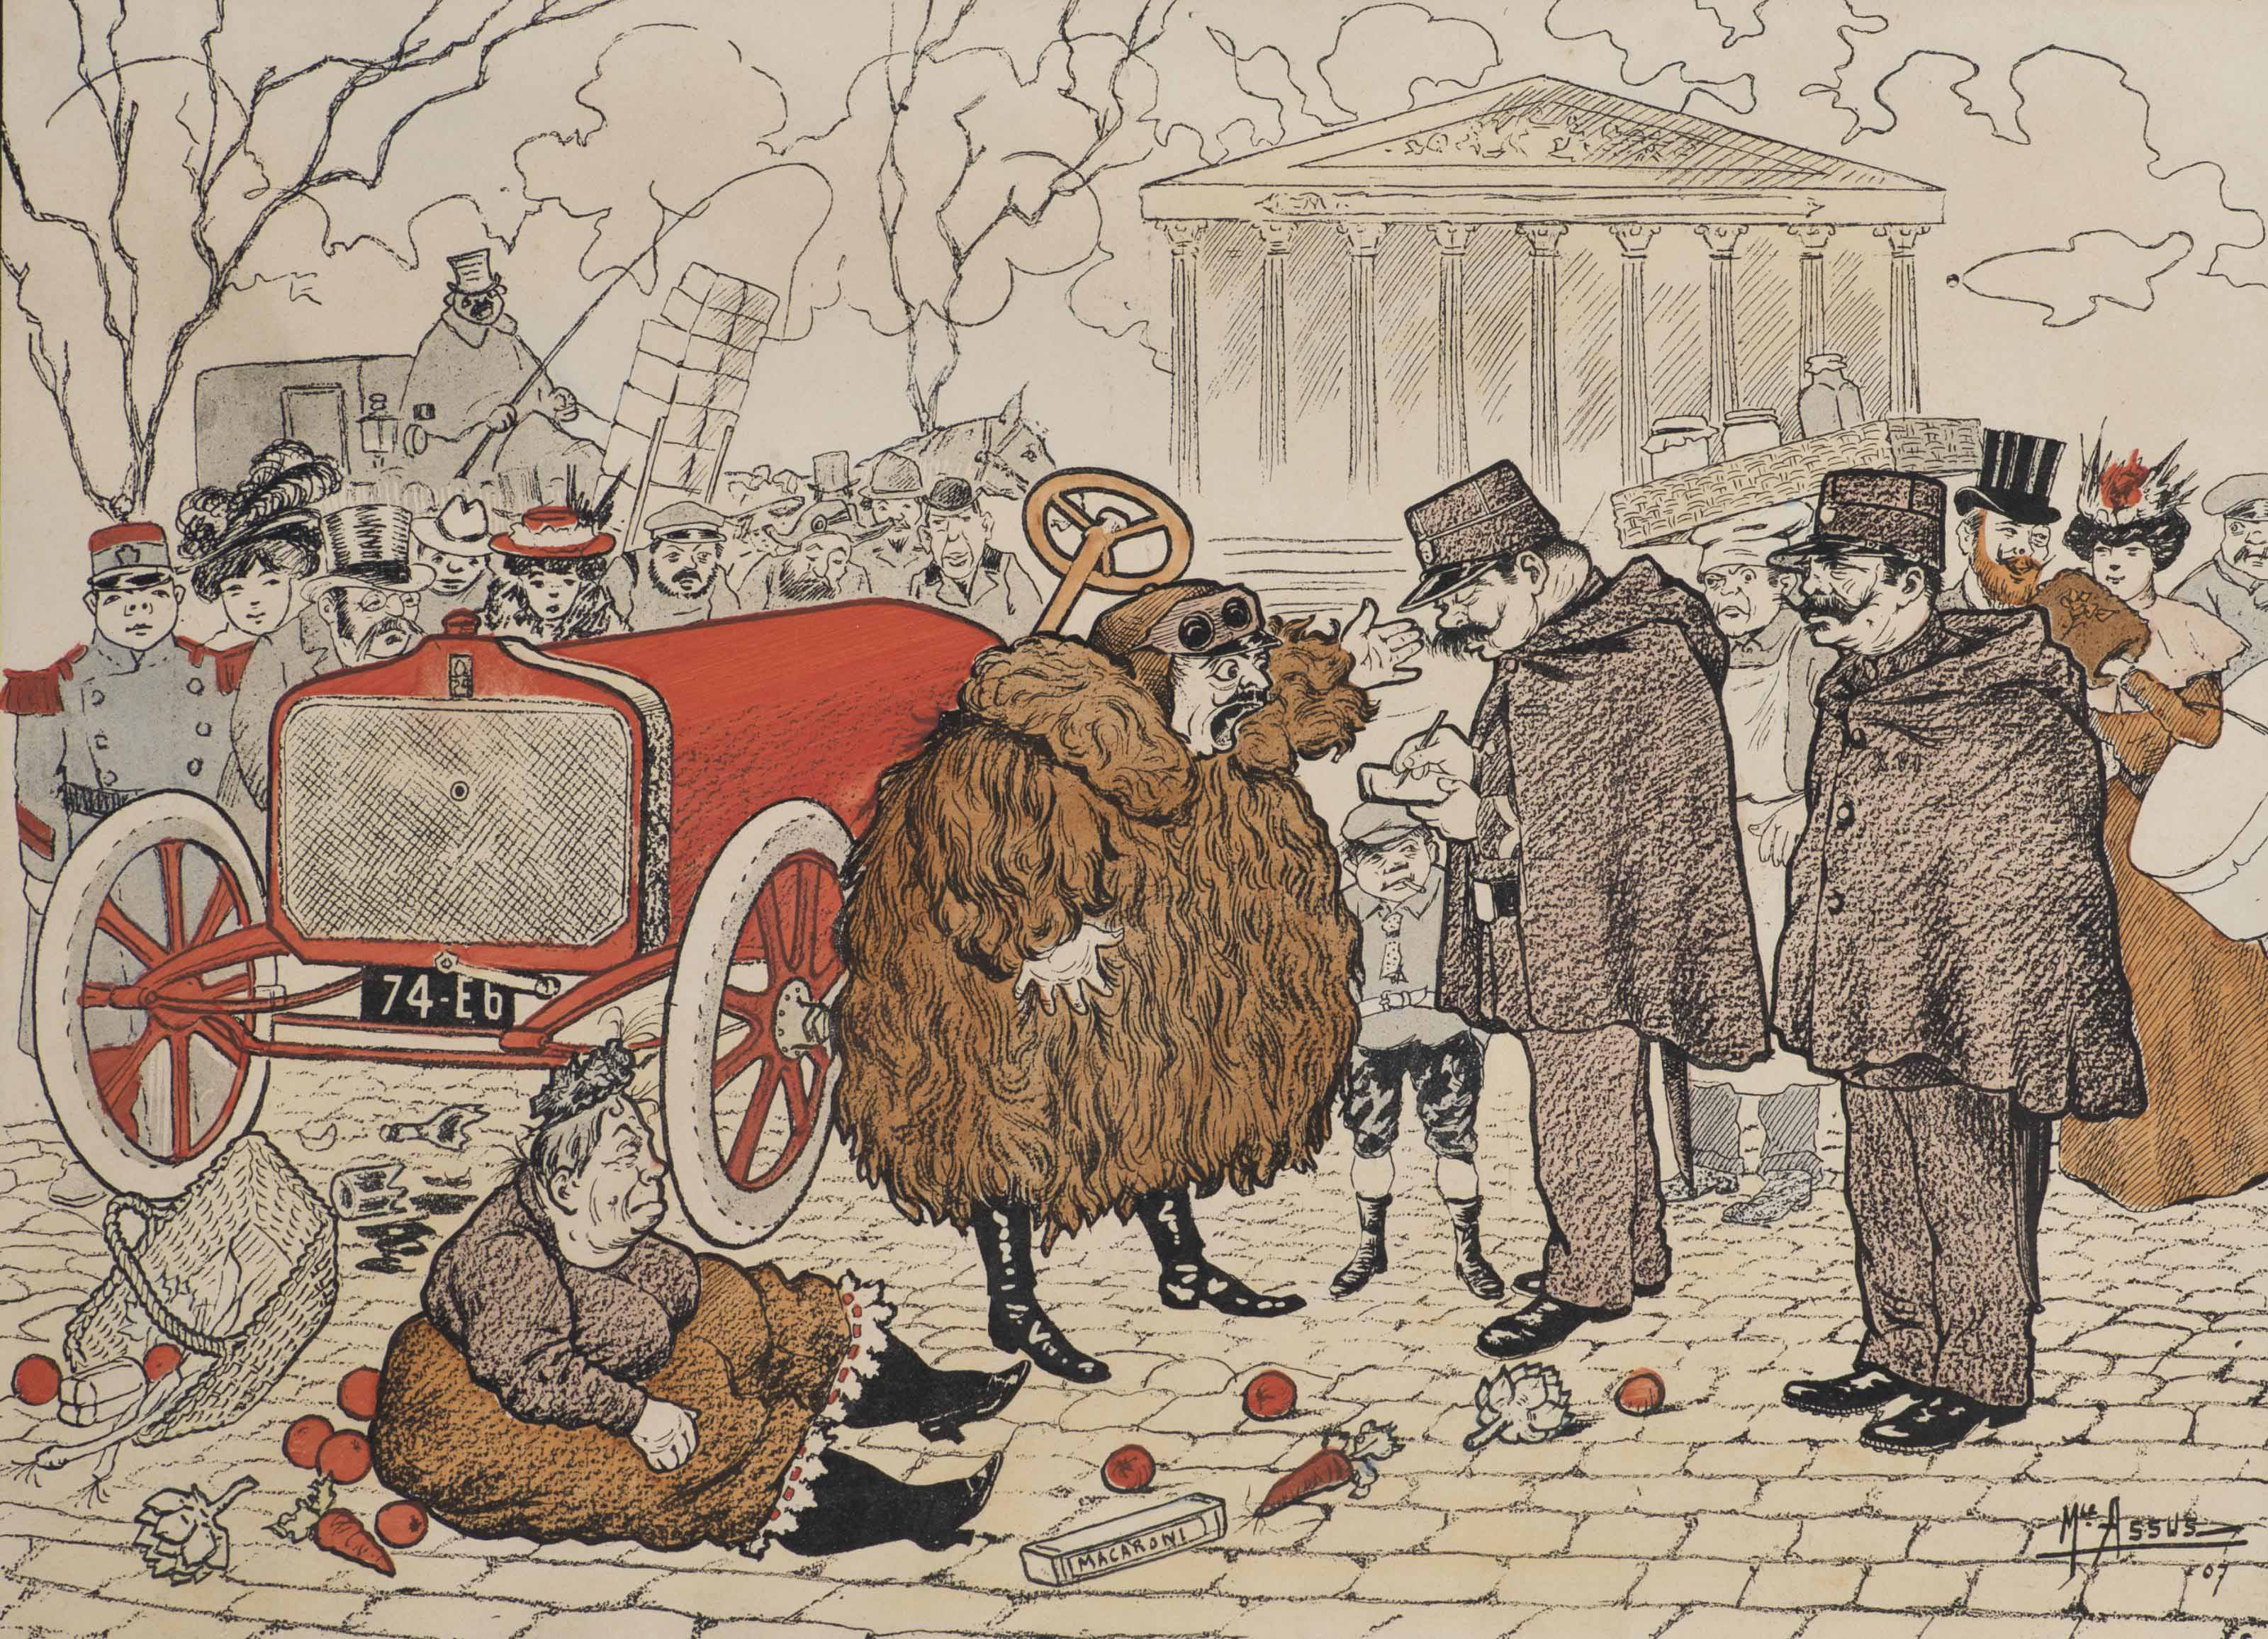 MAURICE ASSUS (1880-1955)